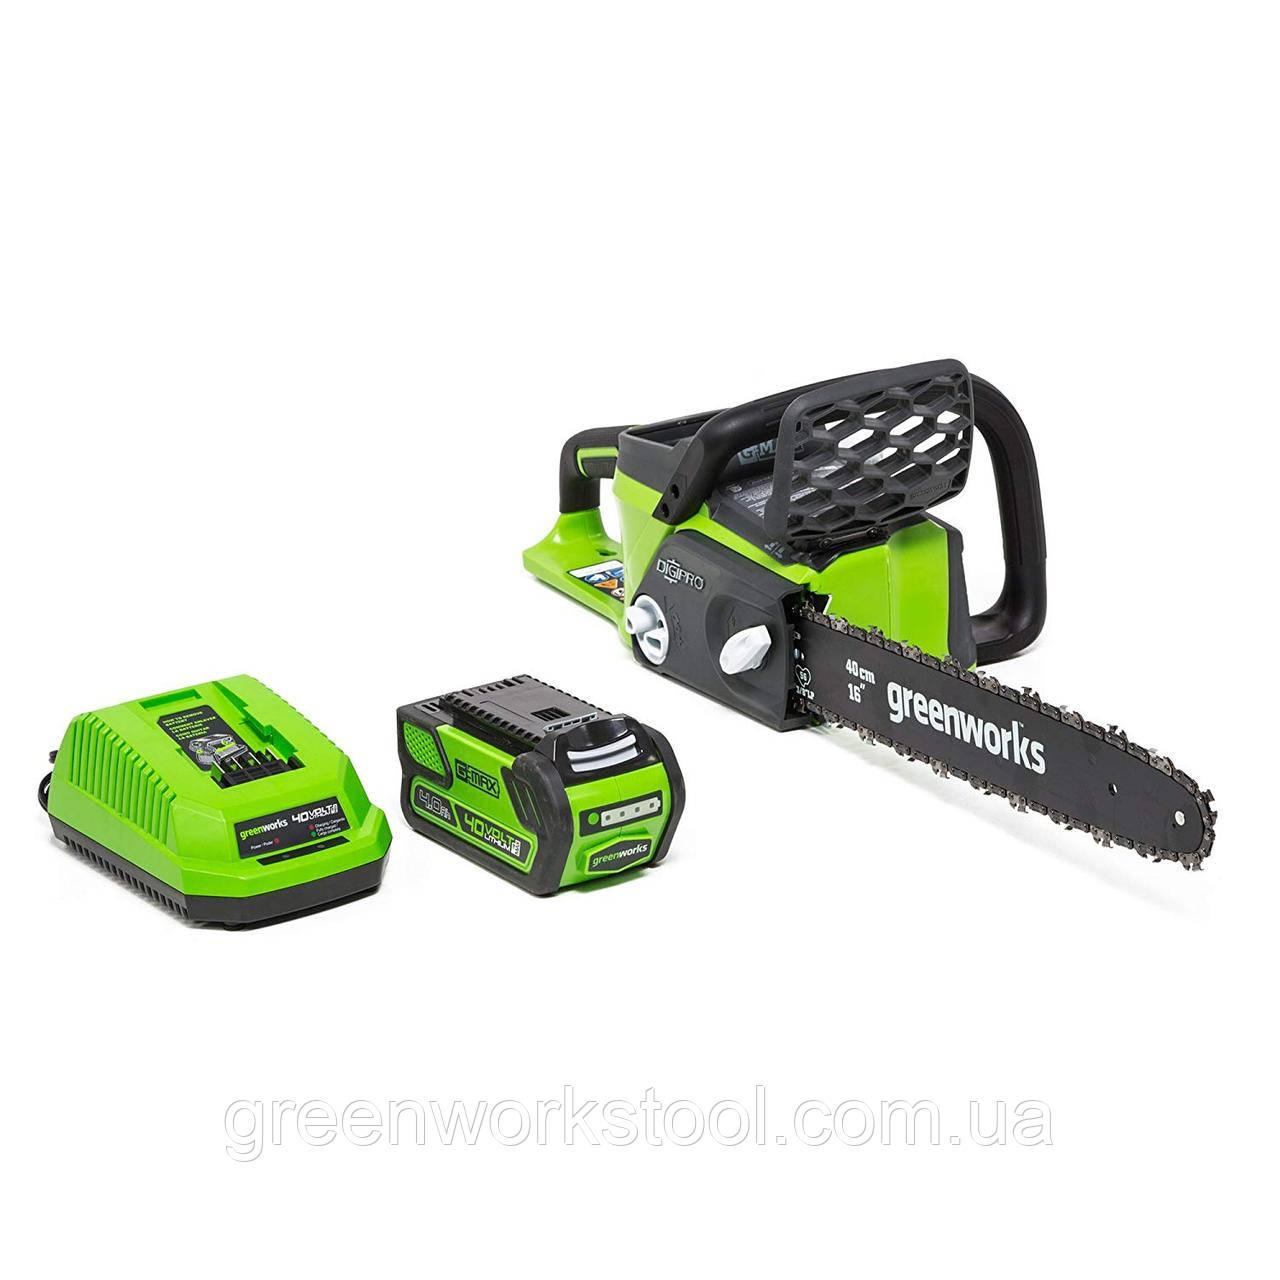 Аккумуляторная цепная пила GreenWorks GD40CS40K4 G-MAX 40V  DigiPro GD40CS40K4 (20312)